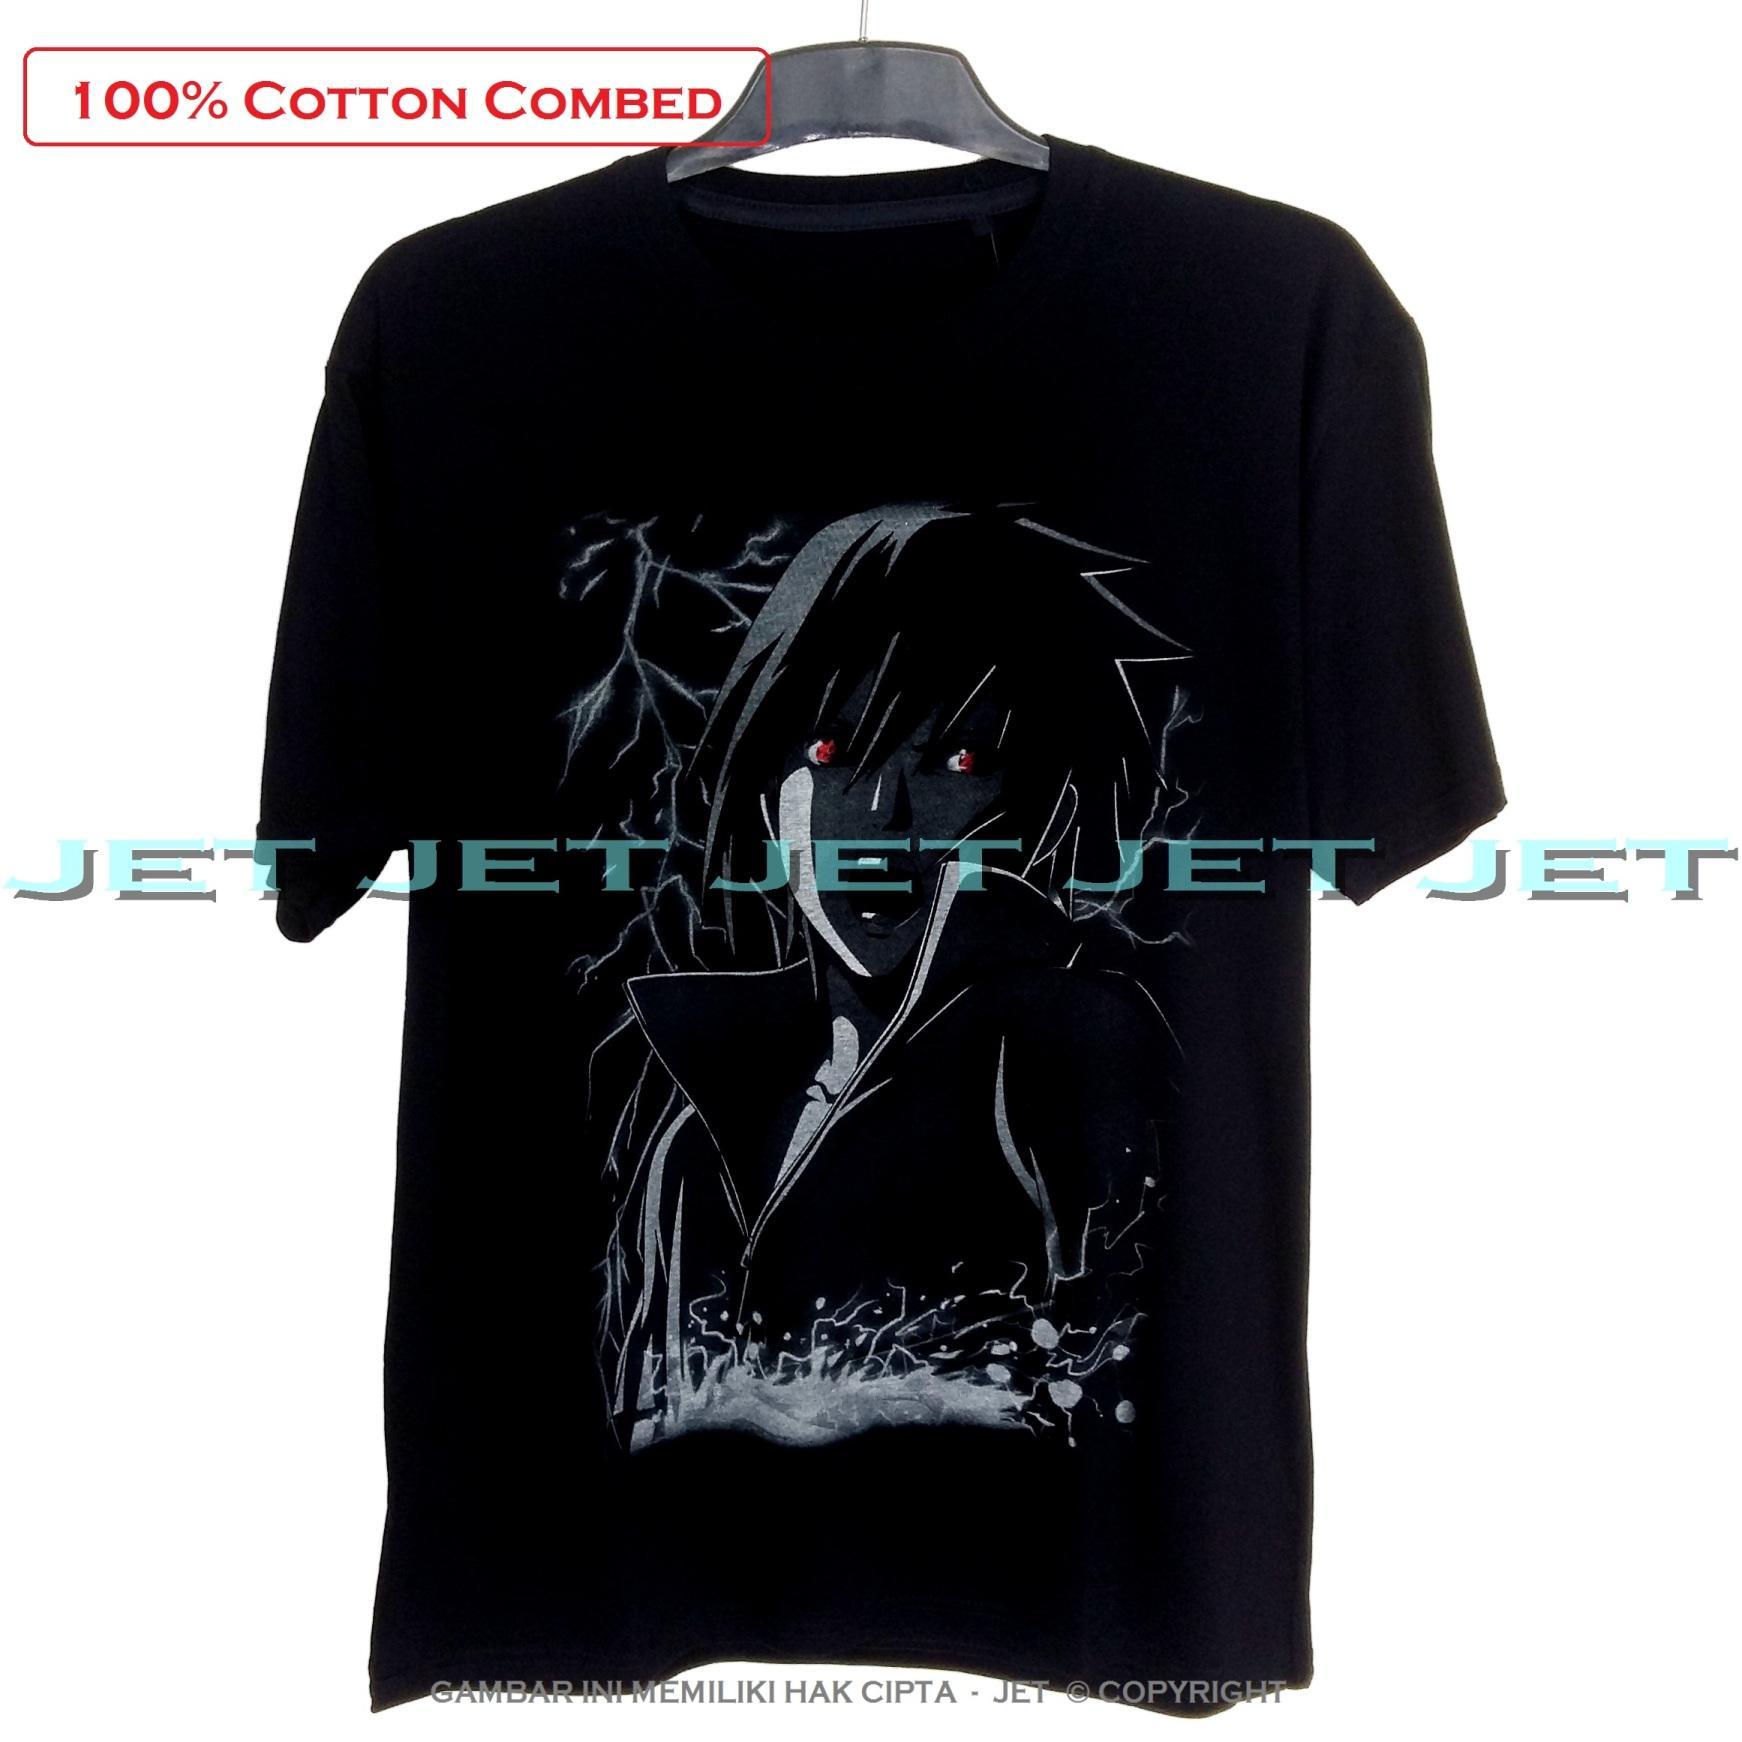 JET – SASUKE 100% Soft Cotton Combed 30s Kaos Distro Fashion T-Shirt Atasan Oblong Baju Pakaian Polos Shirt Pria Wanita Cewe Cowo  Lengan Murah Bagus Keren Jaman Kekinian Jakarta Bandung Hitam Gambar Animasi Kartun Superhero Anime Naruto Kyubi Uciha sarin